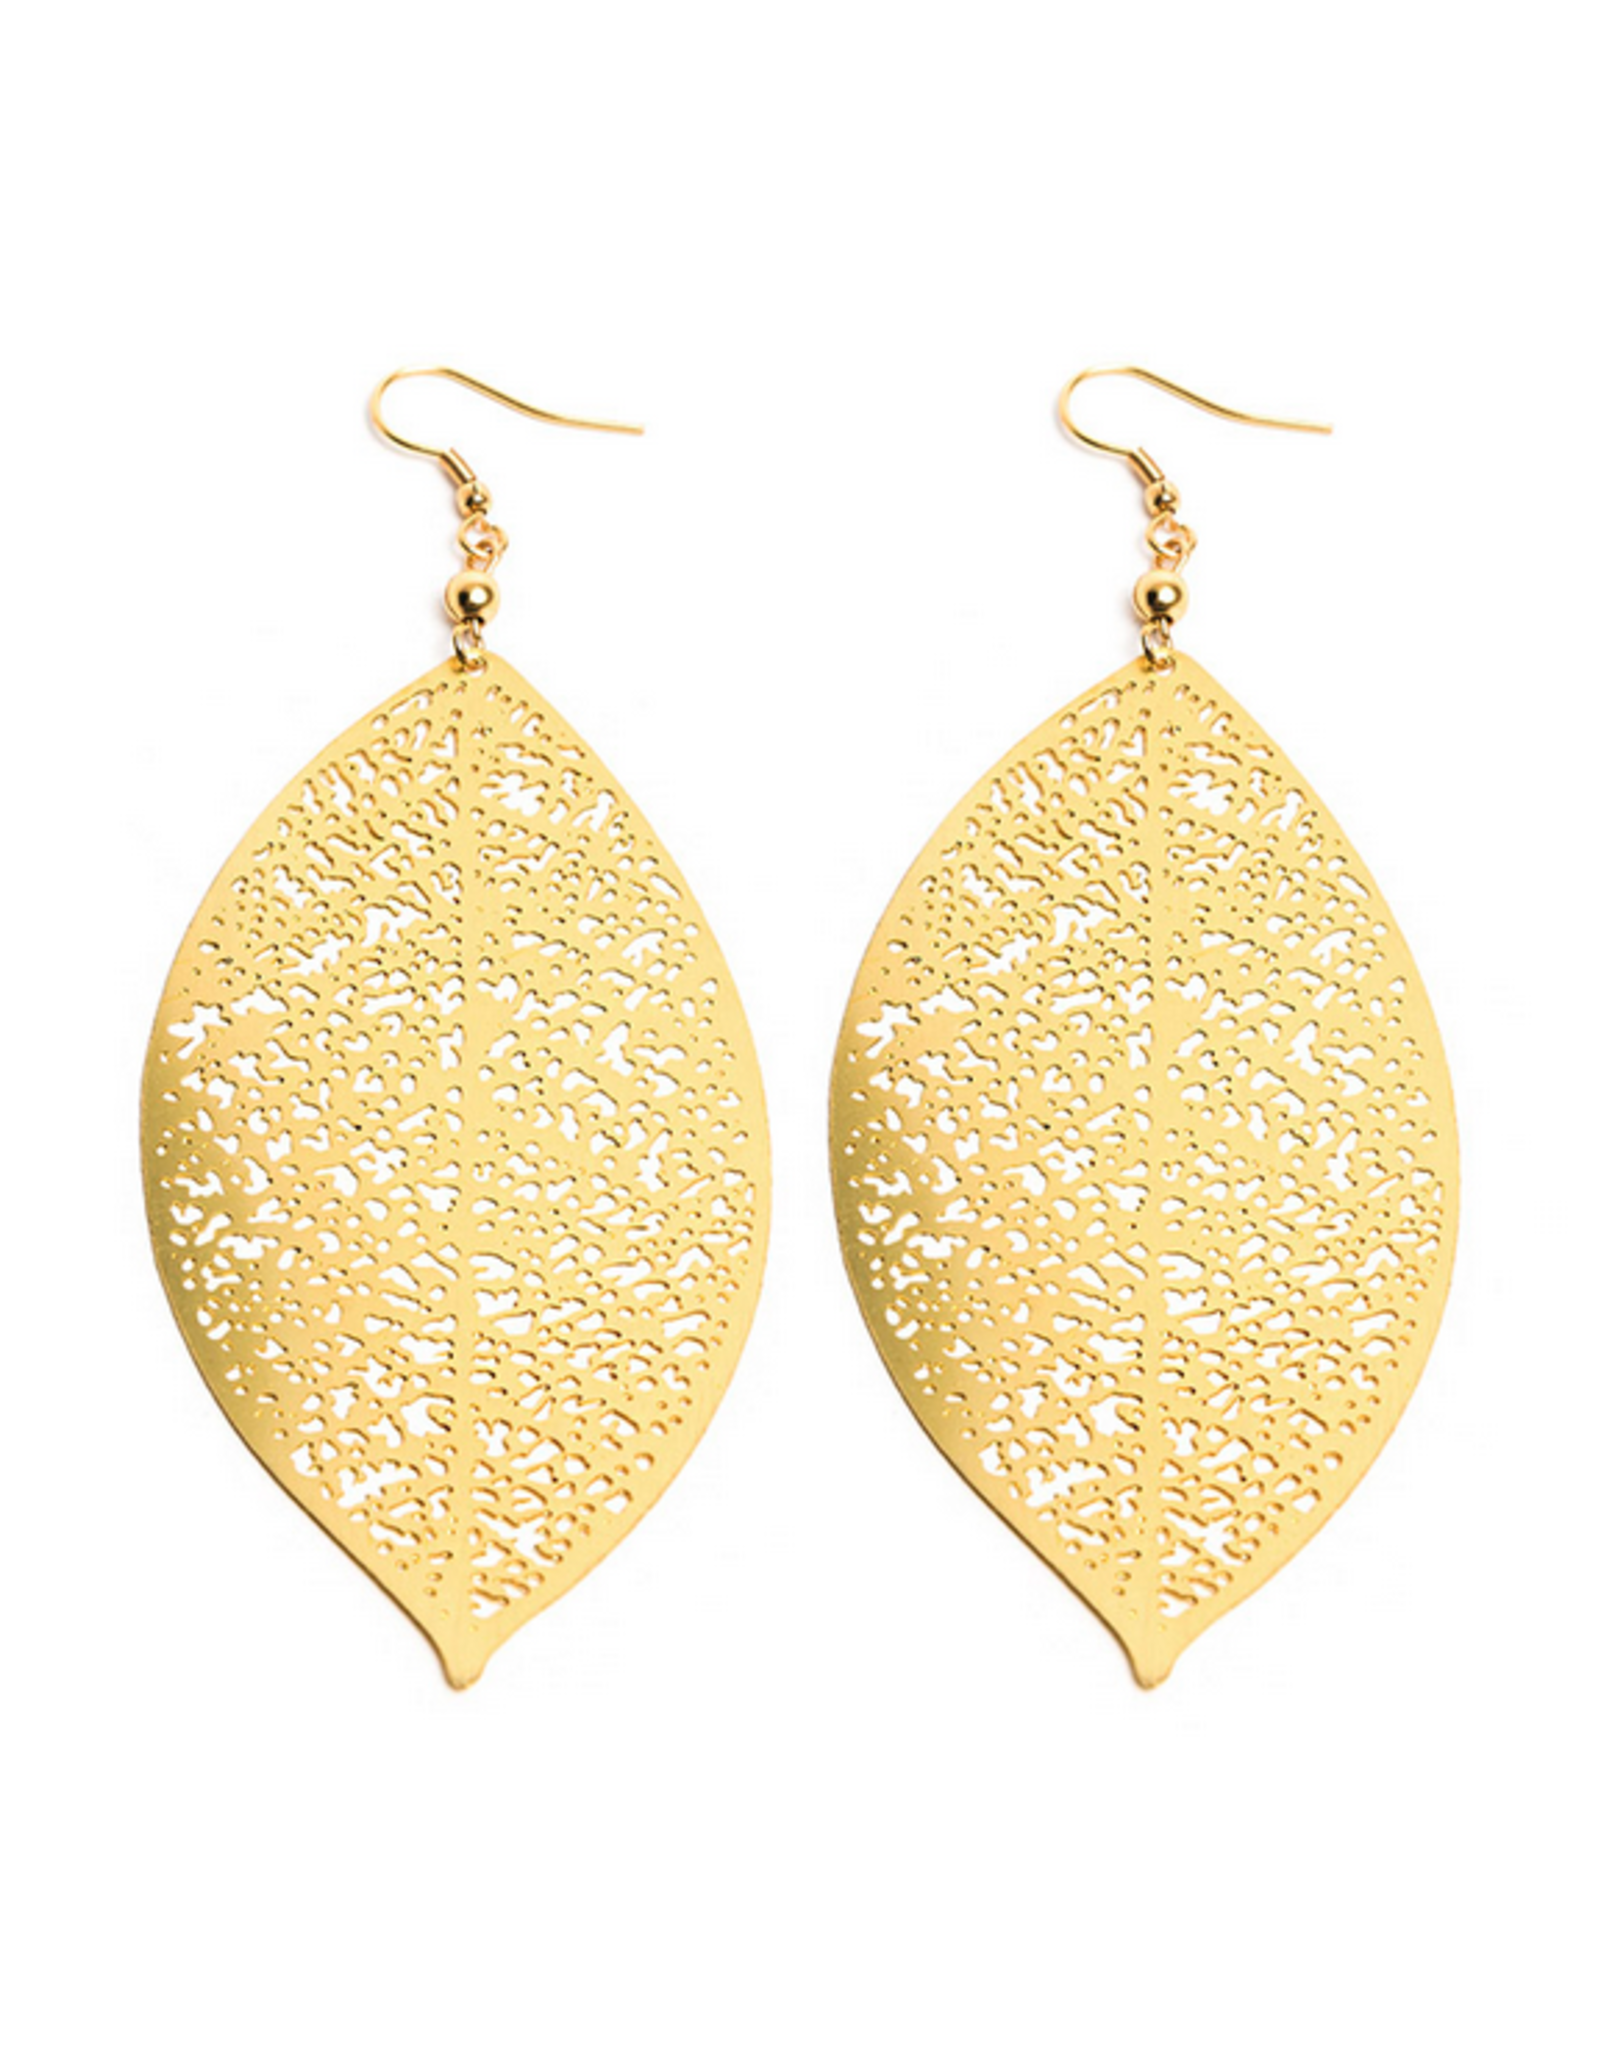 VESTOPAZZO Brass Leaves Earrings